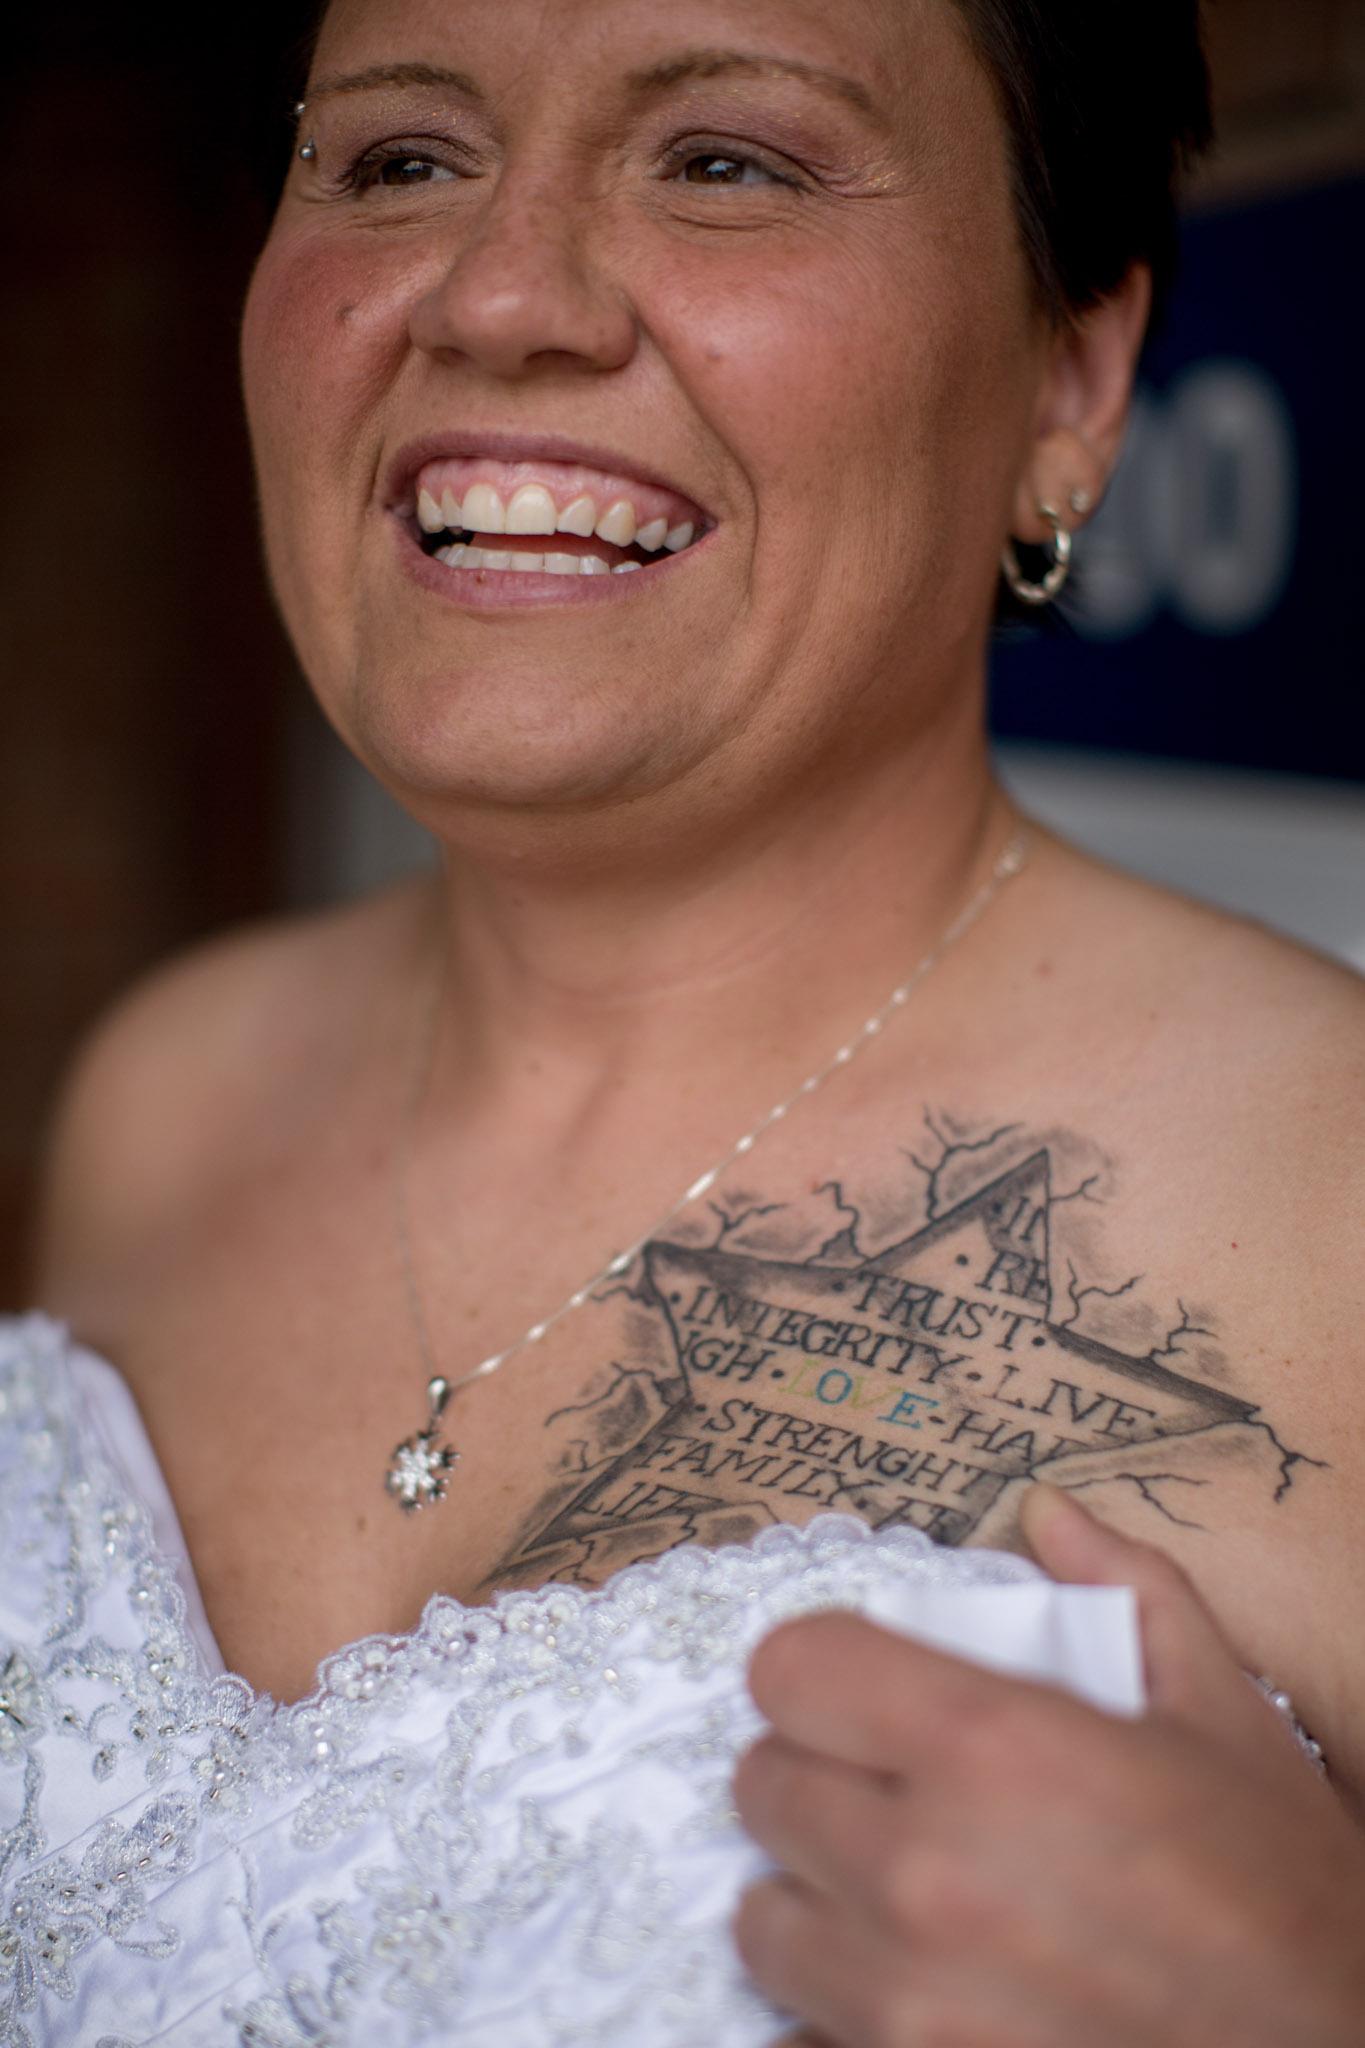 Kansas_City_Small_Wedding_Venue_Elope_Intimate_Ceremony_Budget_Affordable_IMG_7964.jpg